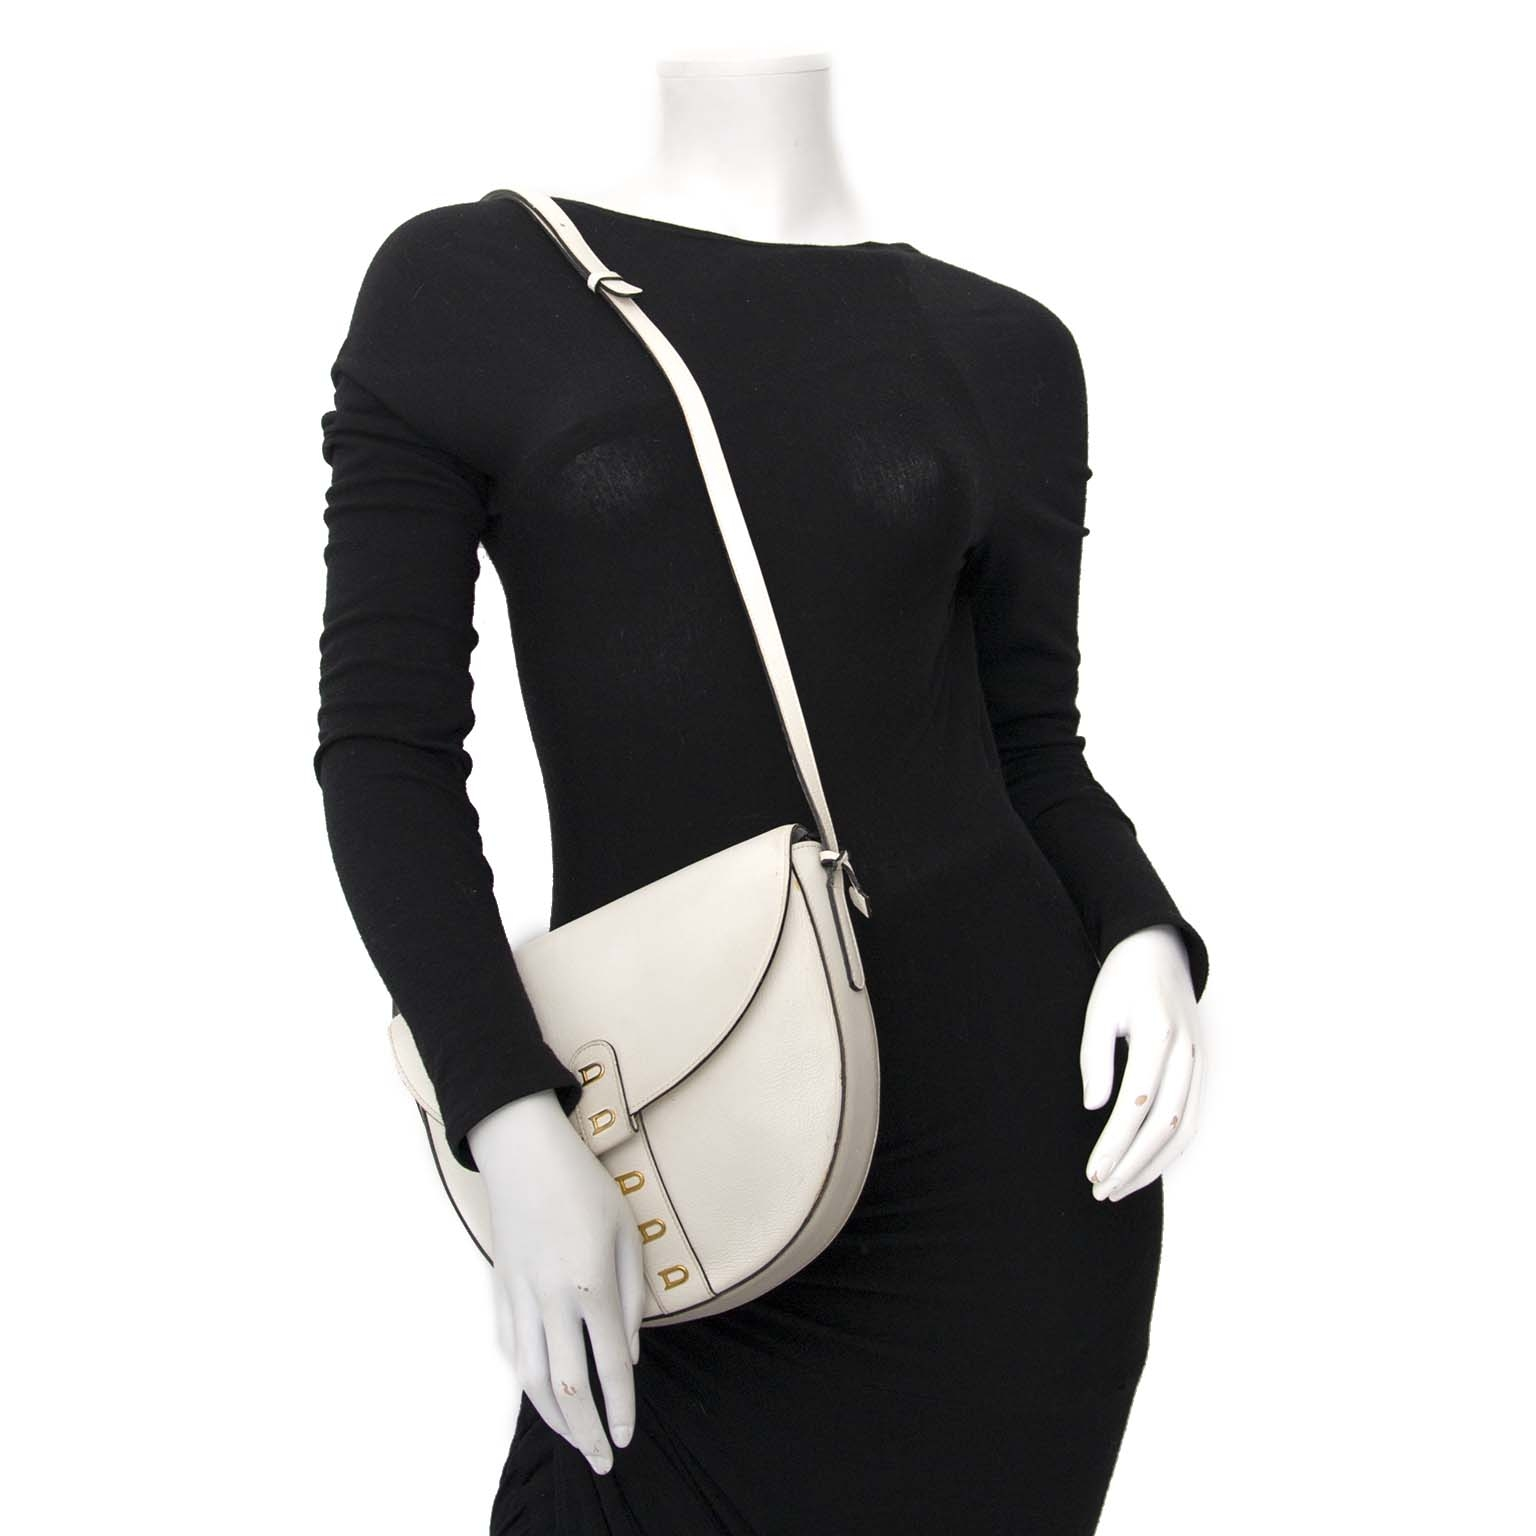 Delvaux White Leather Crossbody Saddle Bag Buy authentic designer Delvaux secondhand bags at Labellov at the best price. Safe and secure shopping. Koop tweedehands authentieke Delvaux tassen bij designer webwinkel labellov.